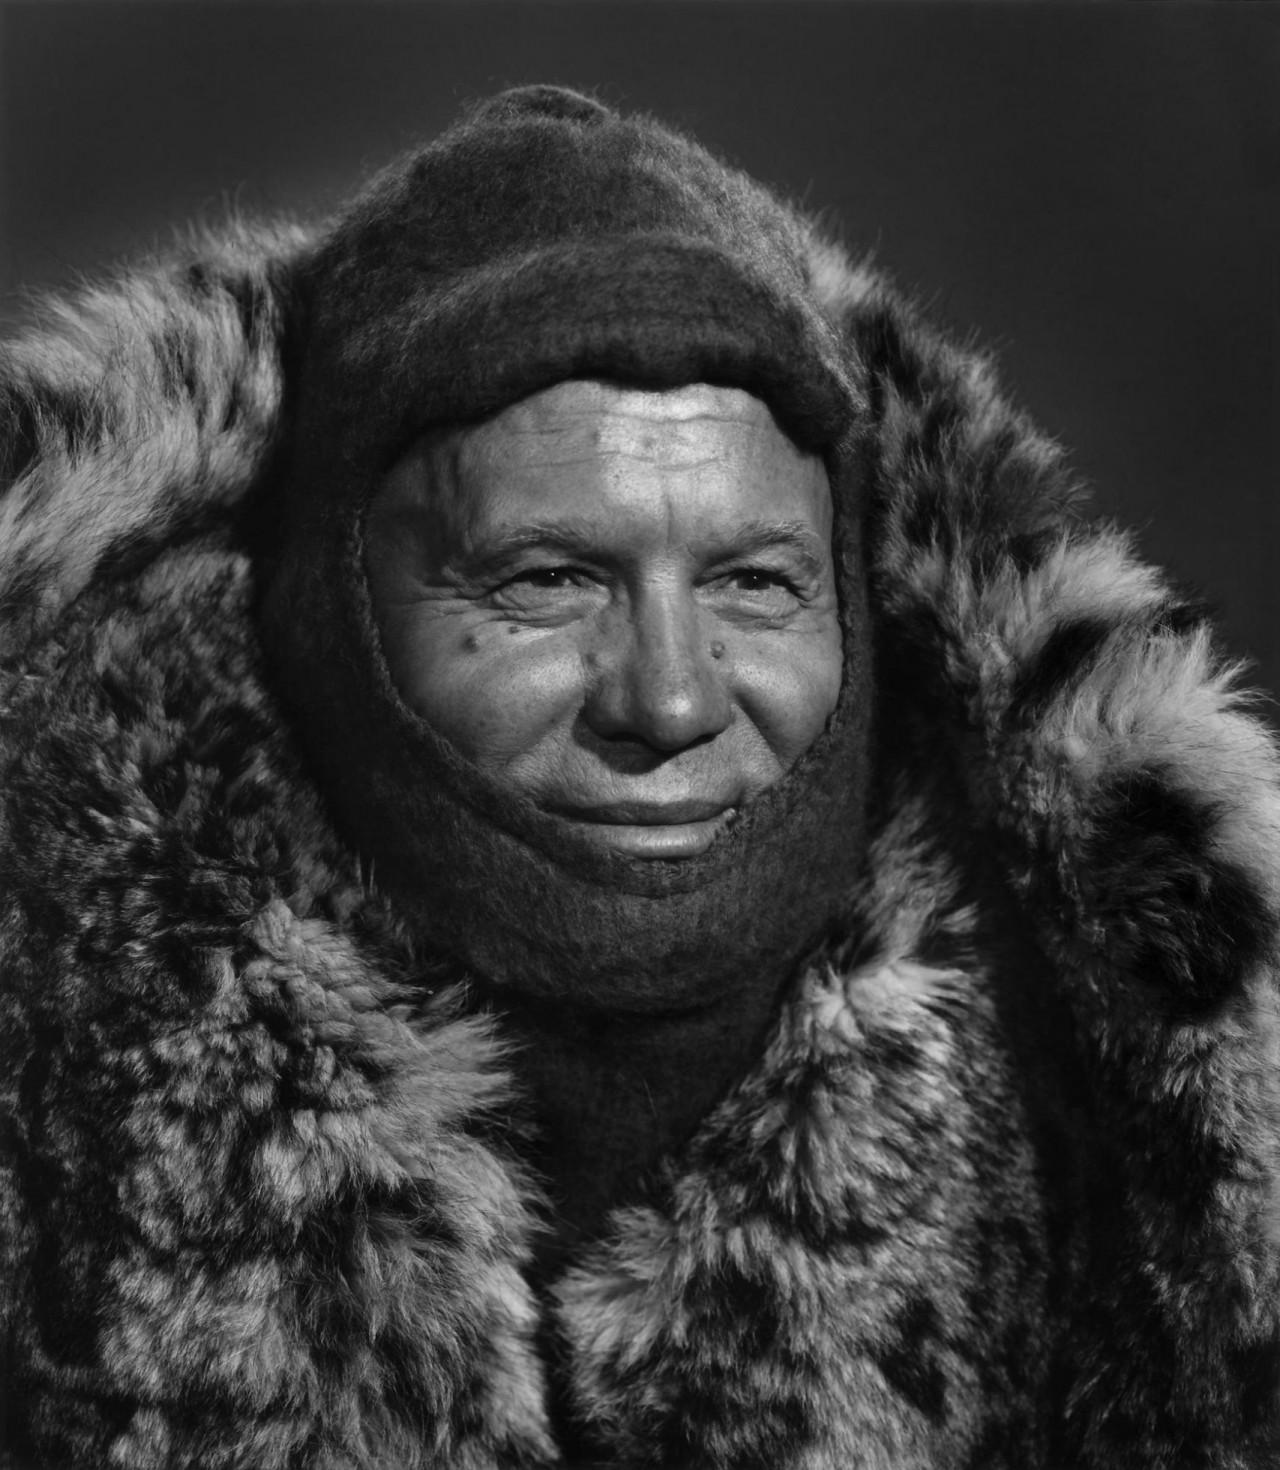 Никита Сергеевич Хрущёв, 1963. Автор Юсуф Карш